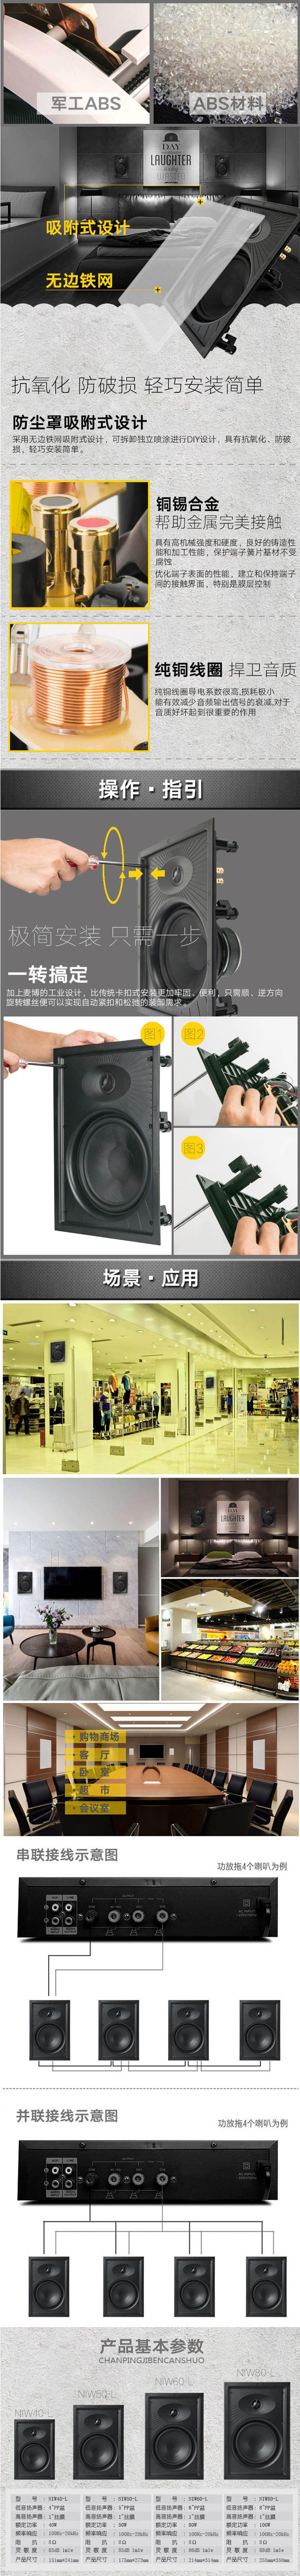 NIW40506080 (L) 2.jpg